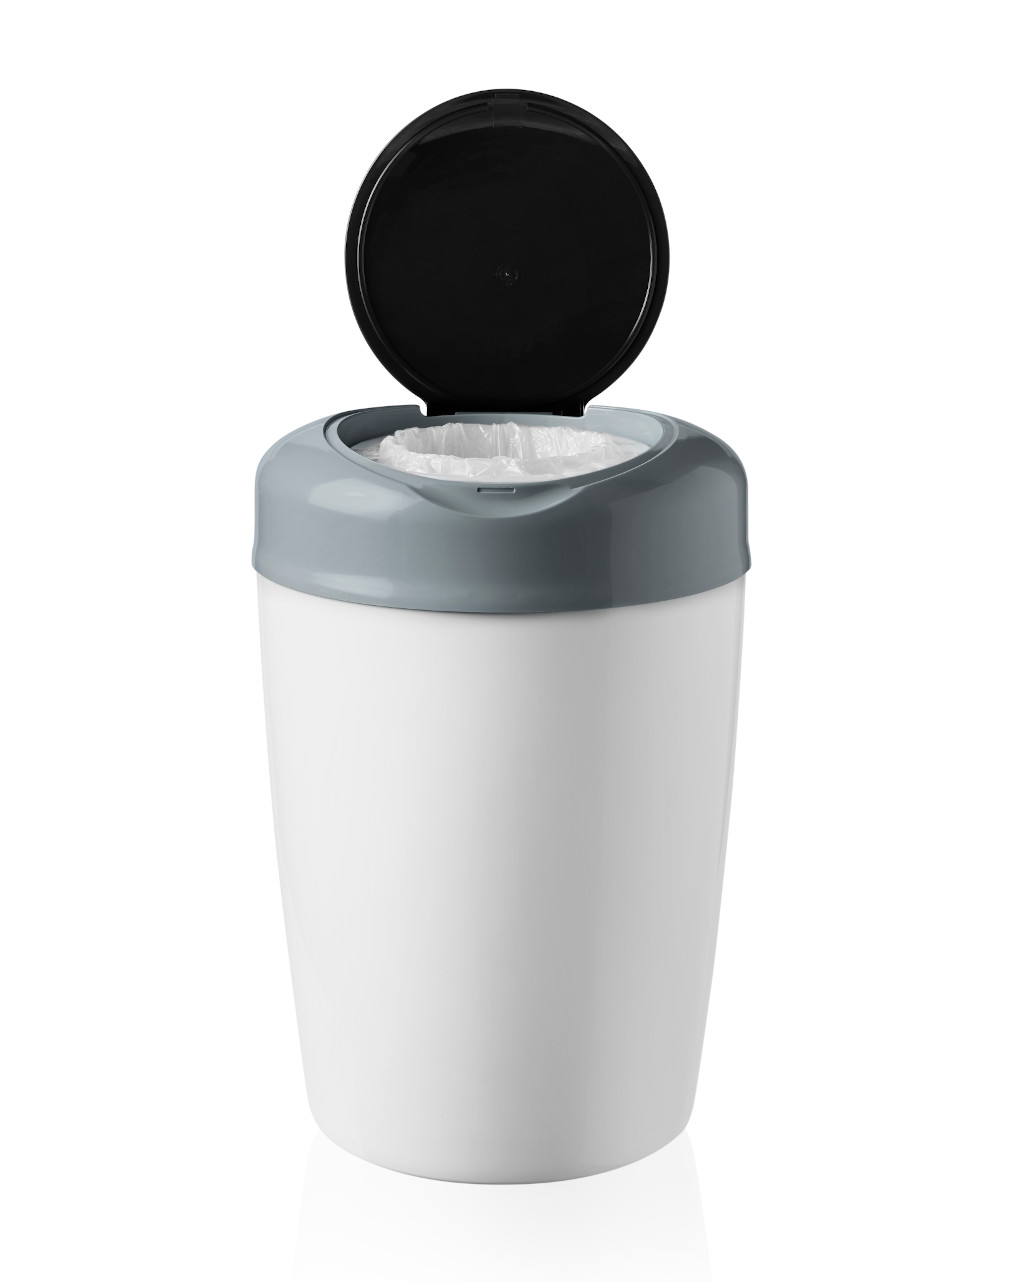 Tommee tippee sangenic simplee sistema di smaltimento pannolini, bianco - Sangenic